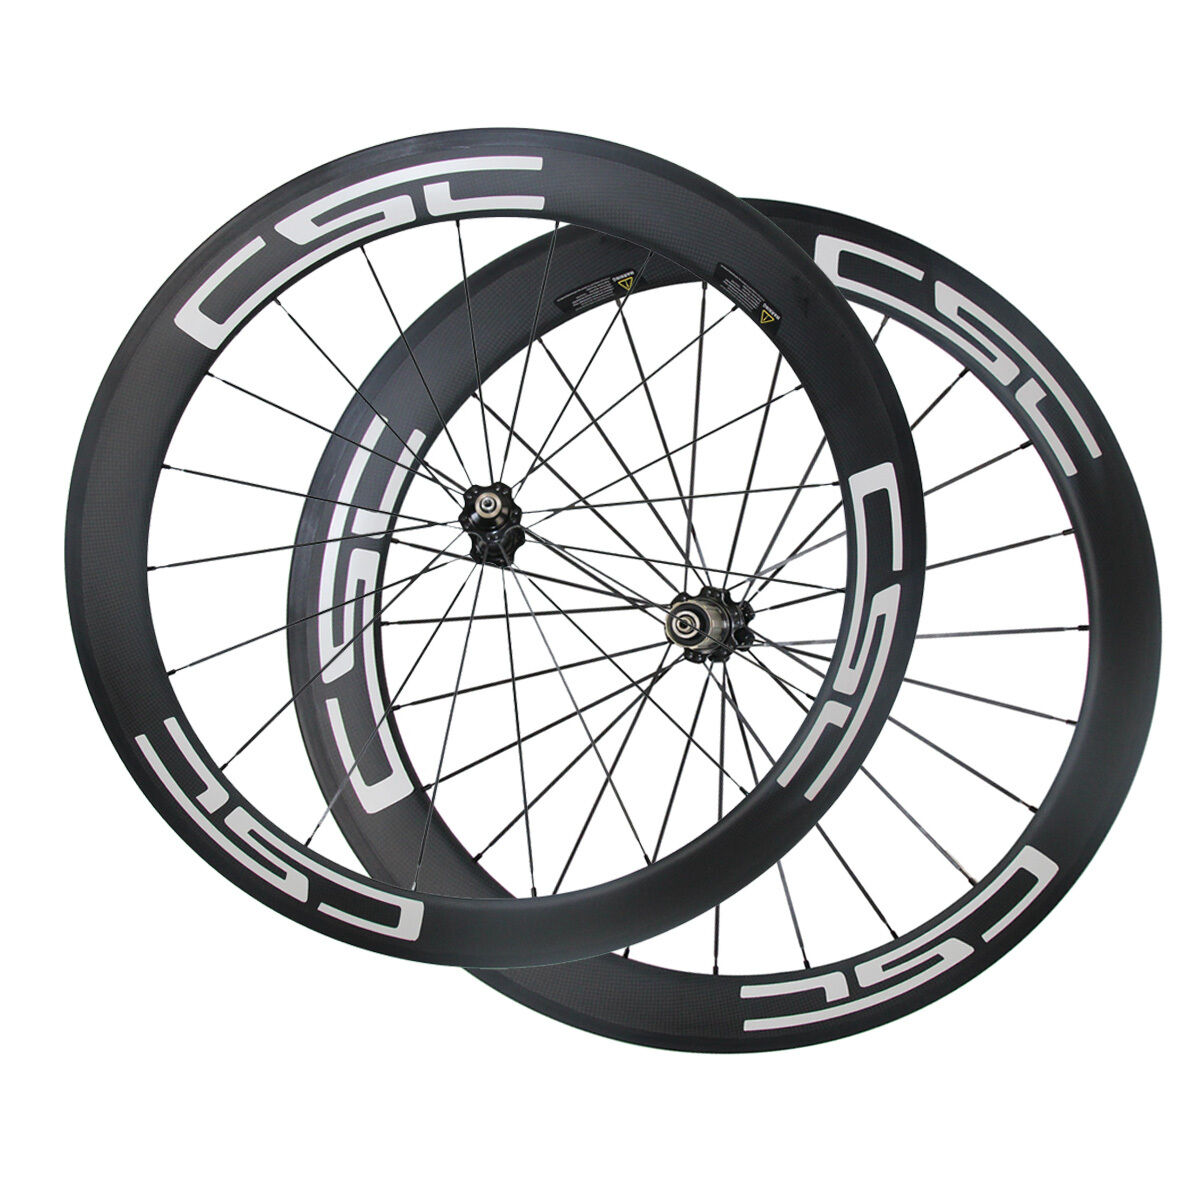 CSC Carbon bike road wheels 700C 60mm Tubular carbon fiber bicycle wheelset